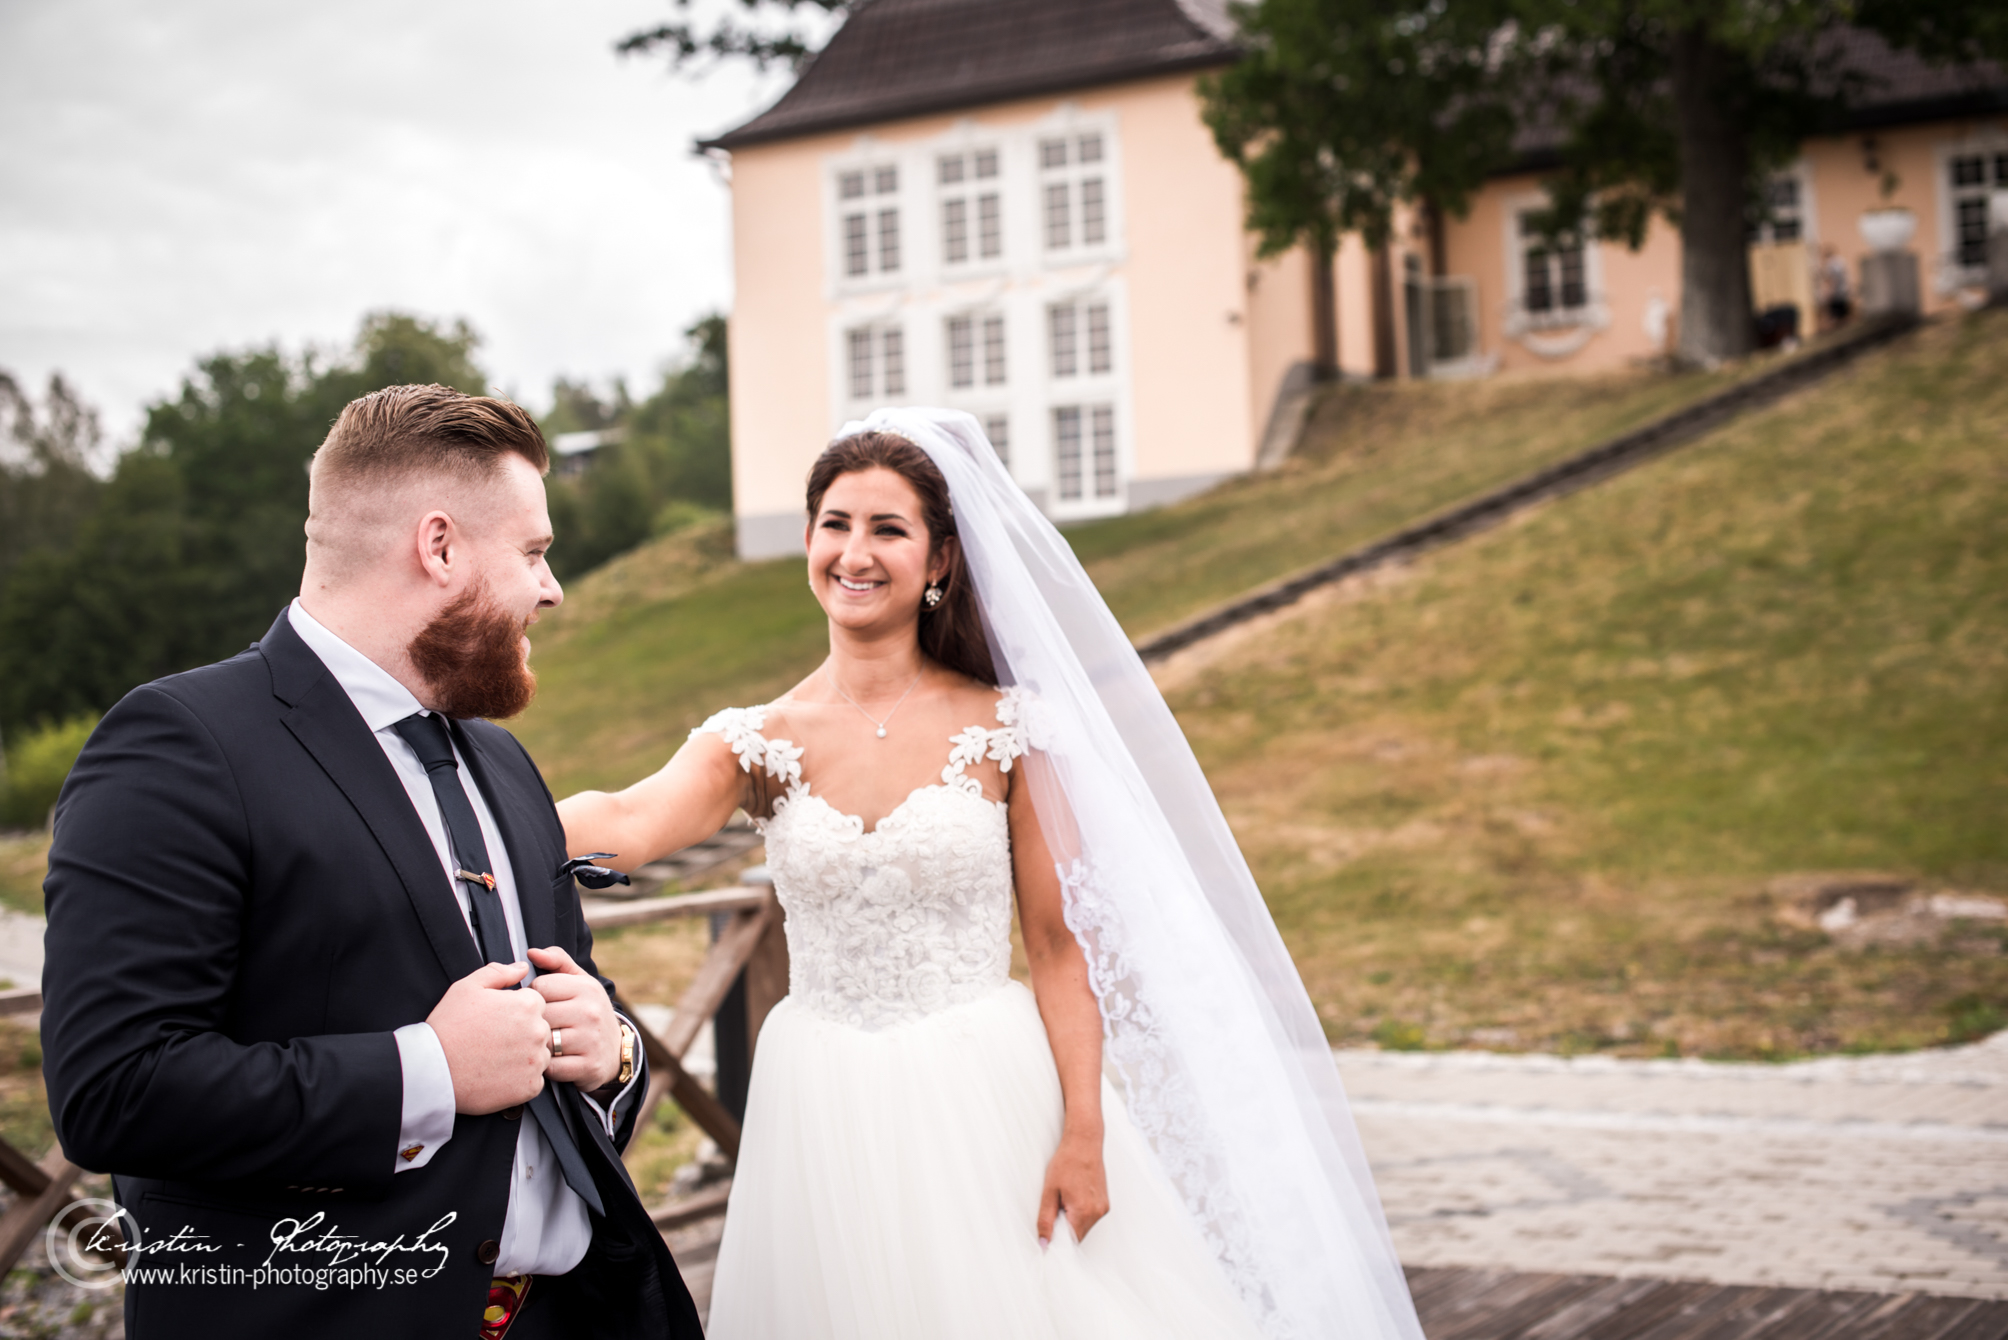 Fotograf i Eskilstuna, Kristin - Photography-81.jpg